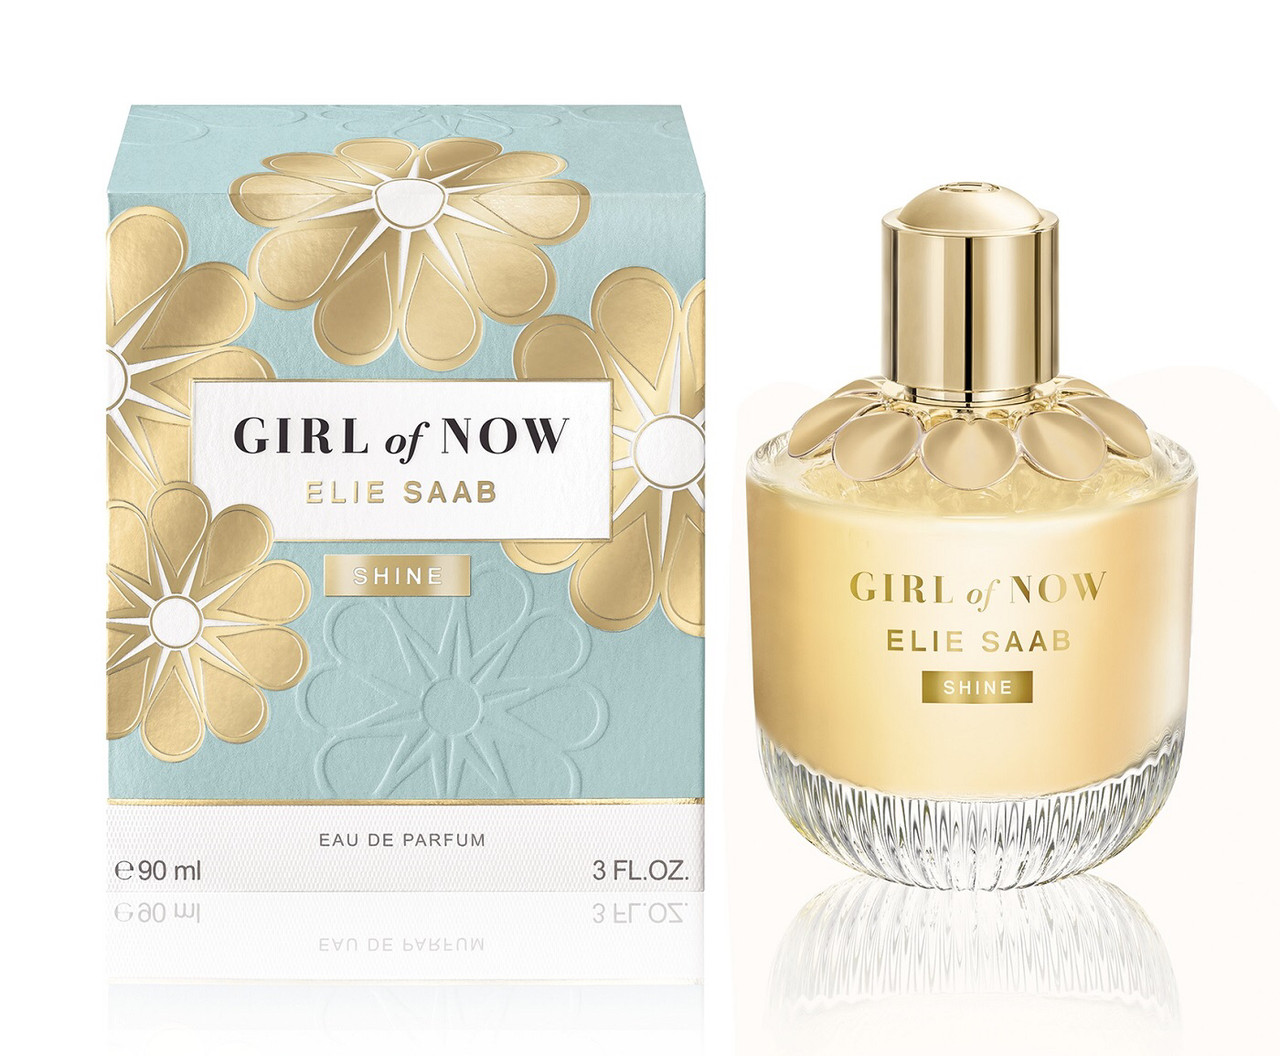 Elie Saab Girl of Now Shine